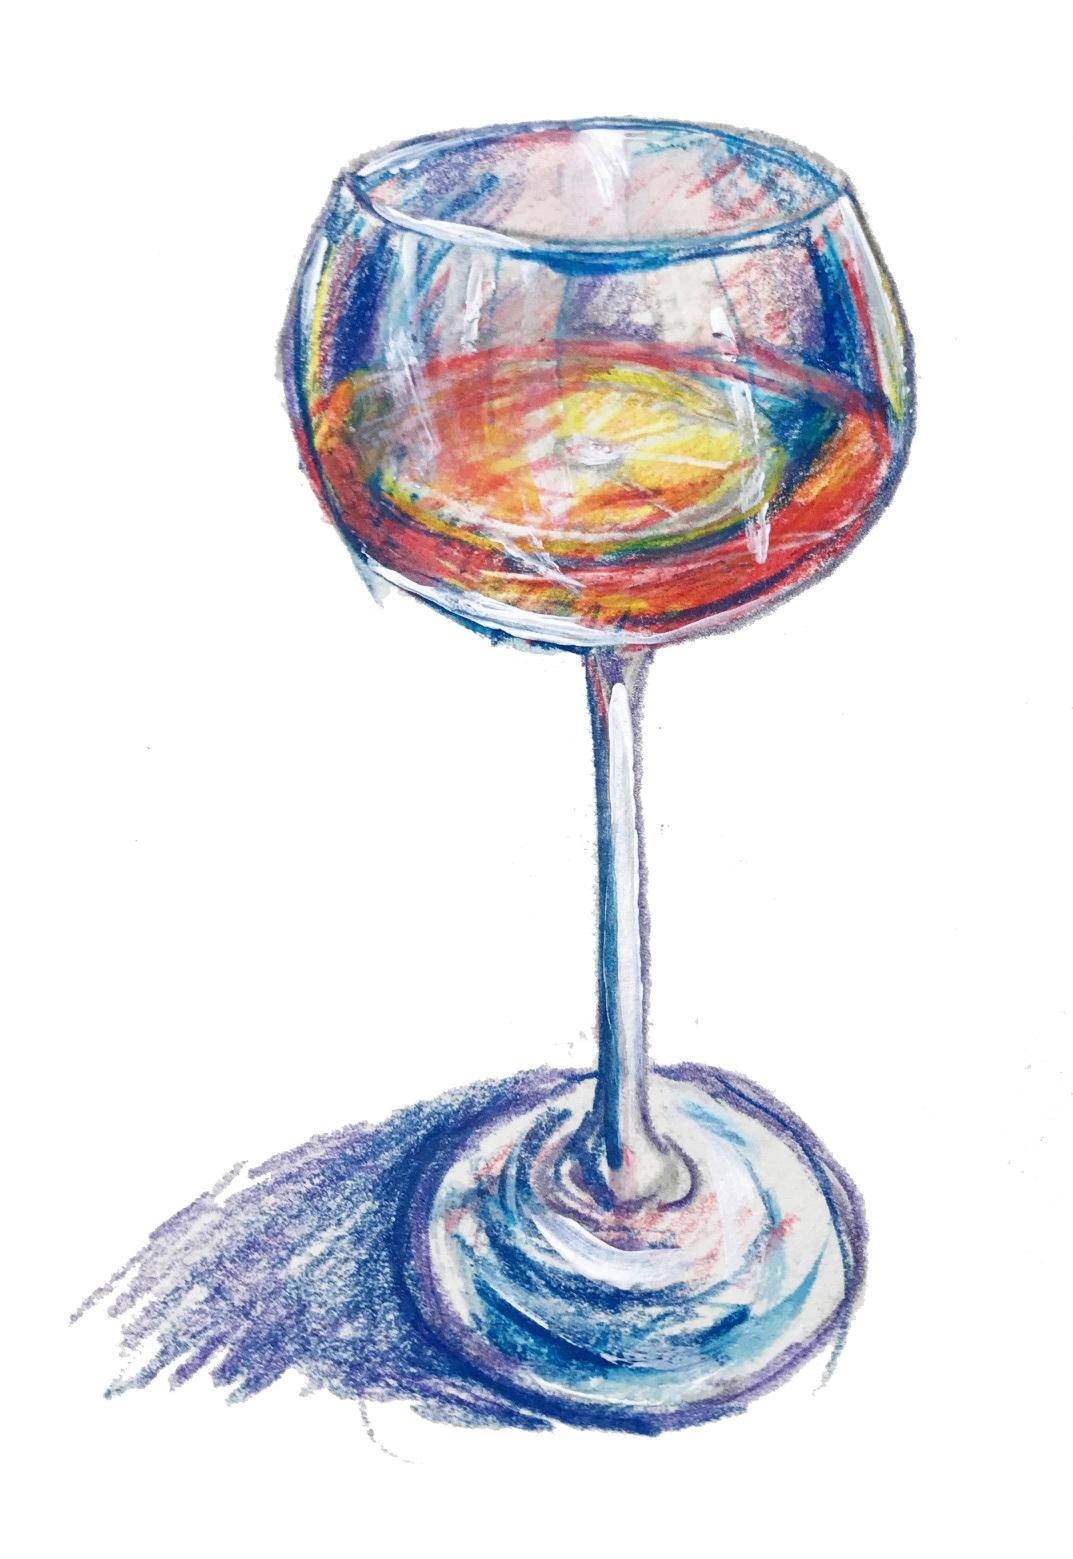 Vin d'Orange: white wine, oranges, and Marie Duffau Armagnac cocktail for summer